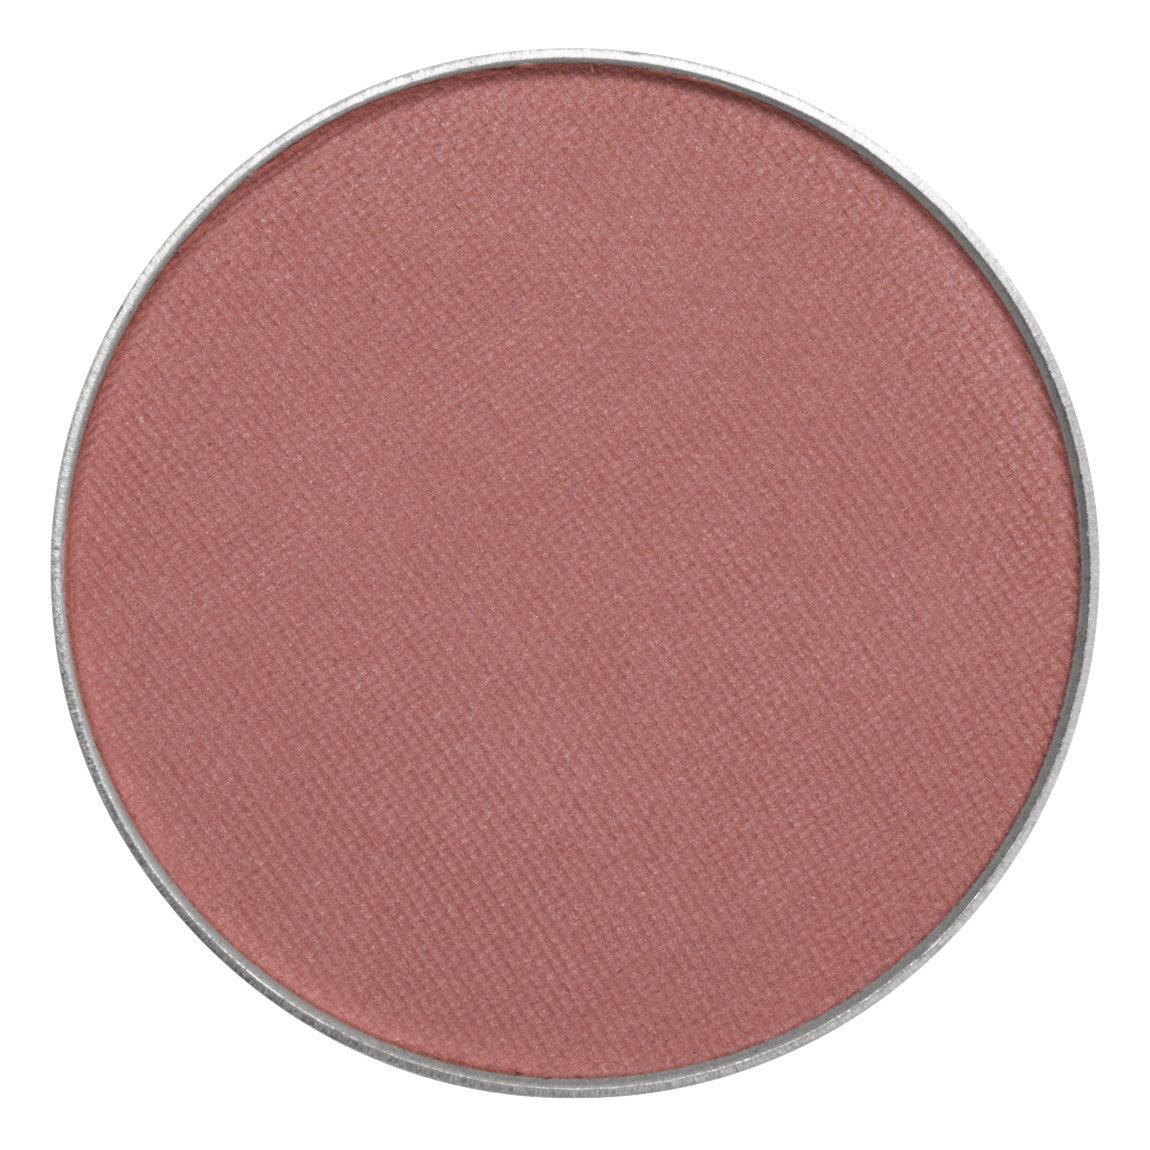 Anastasia Beverly Hills Eye Shadow Single Dusty Rose alternative view 1 - product swatch.